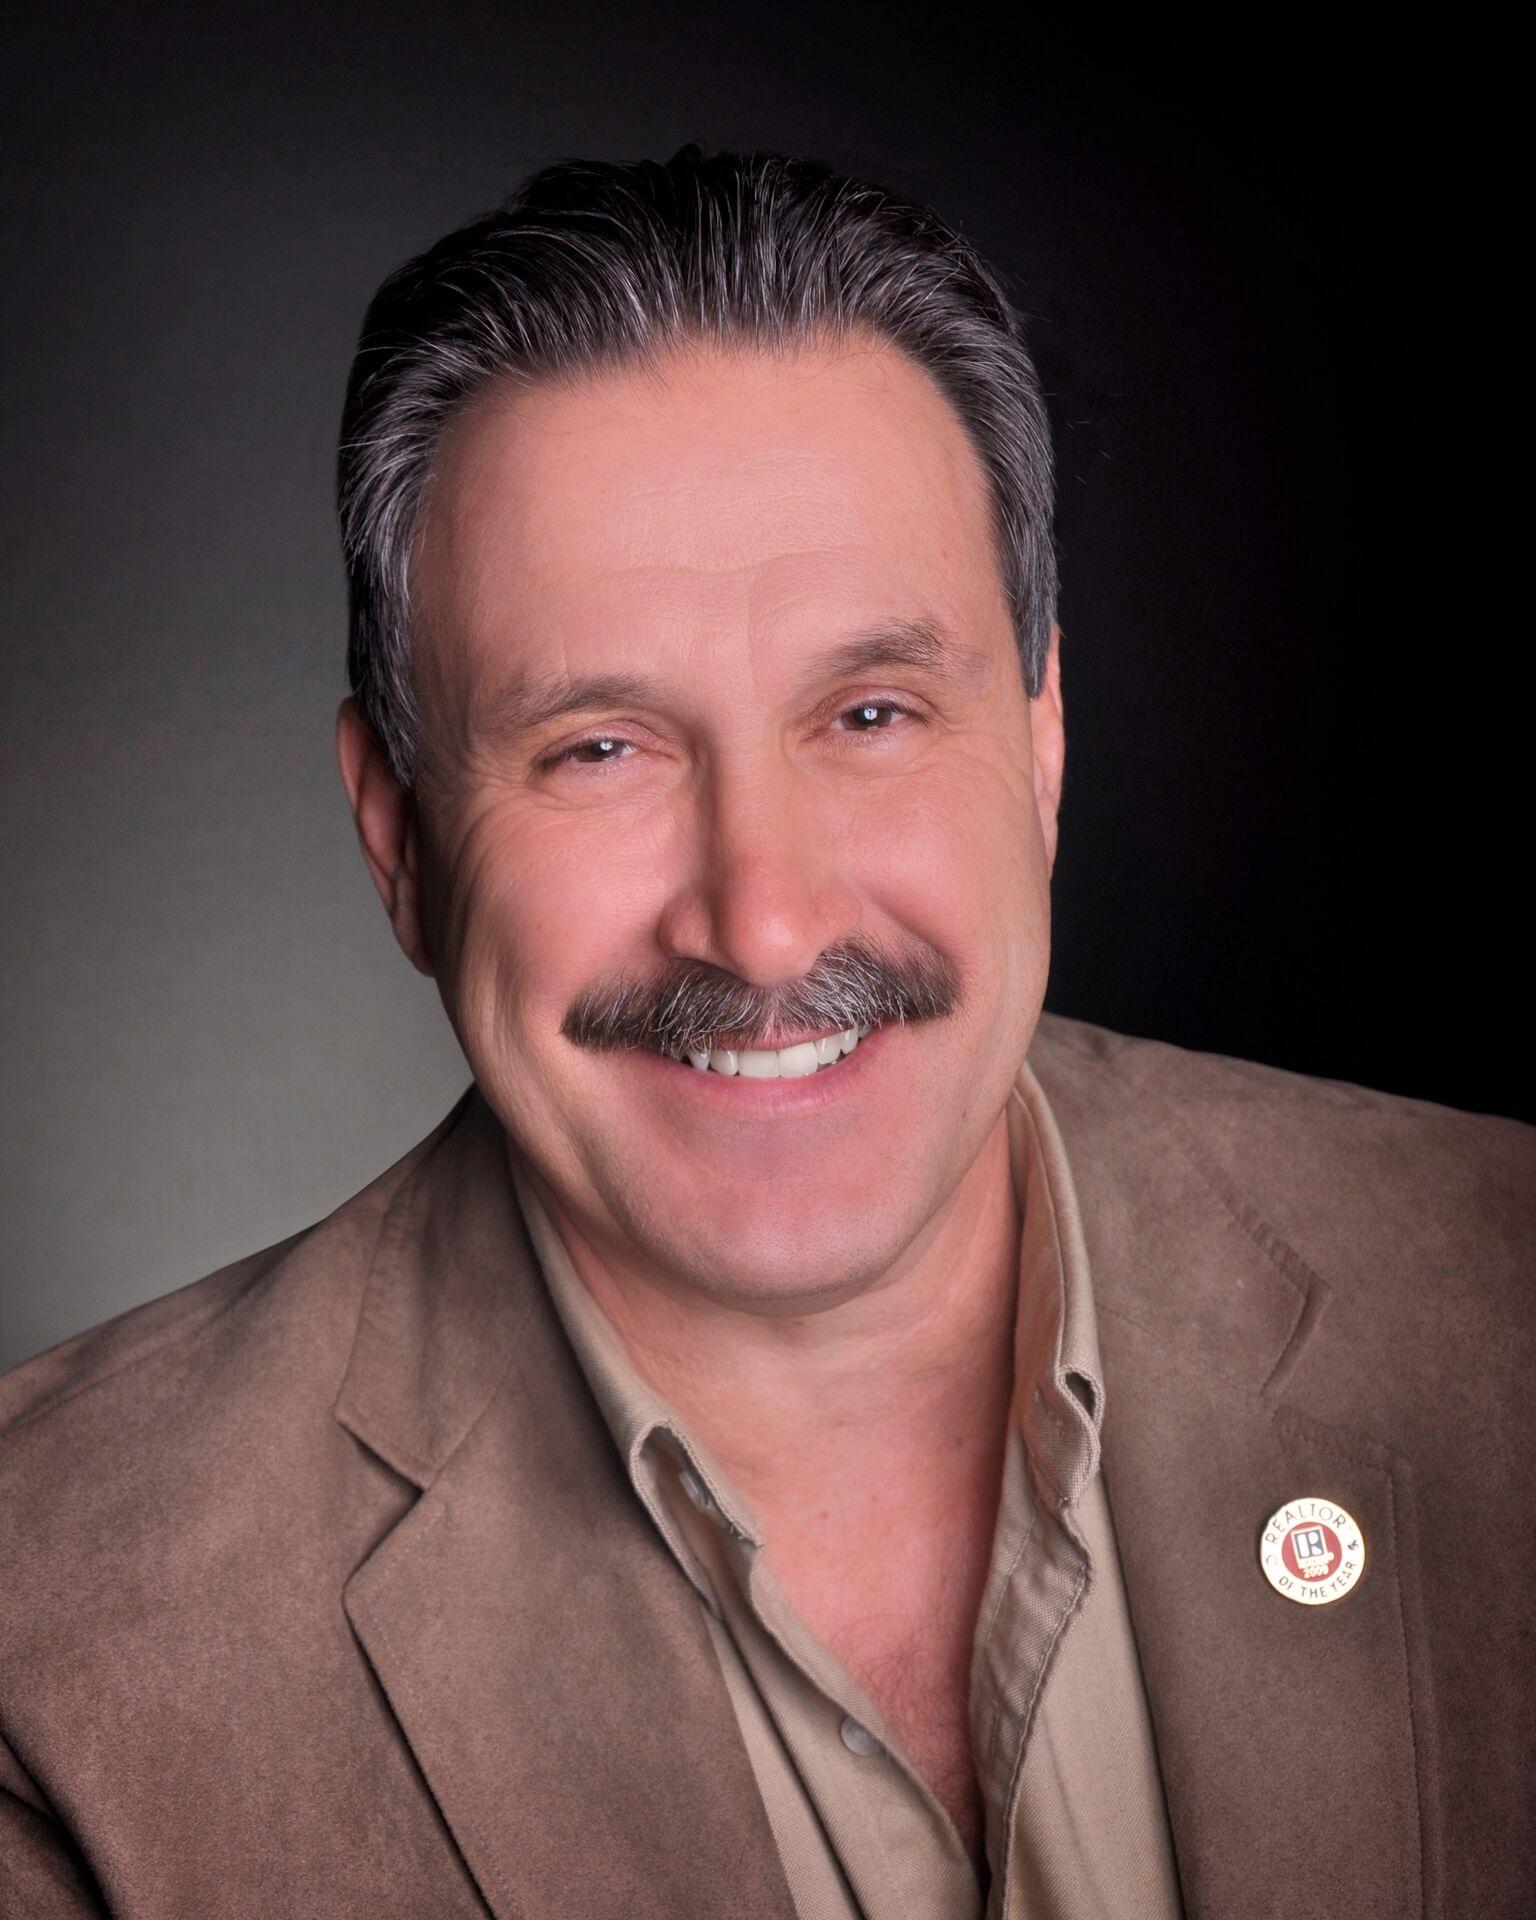 Frank Smedley, Broker Associate